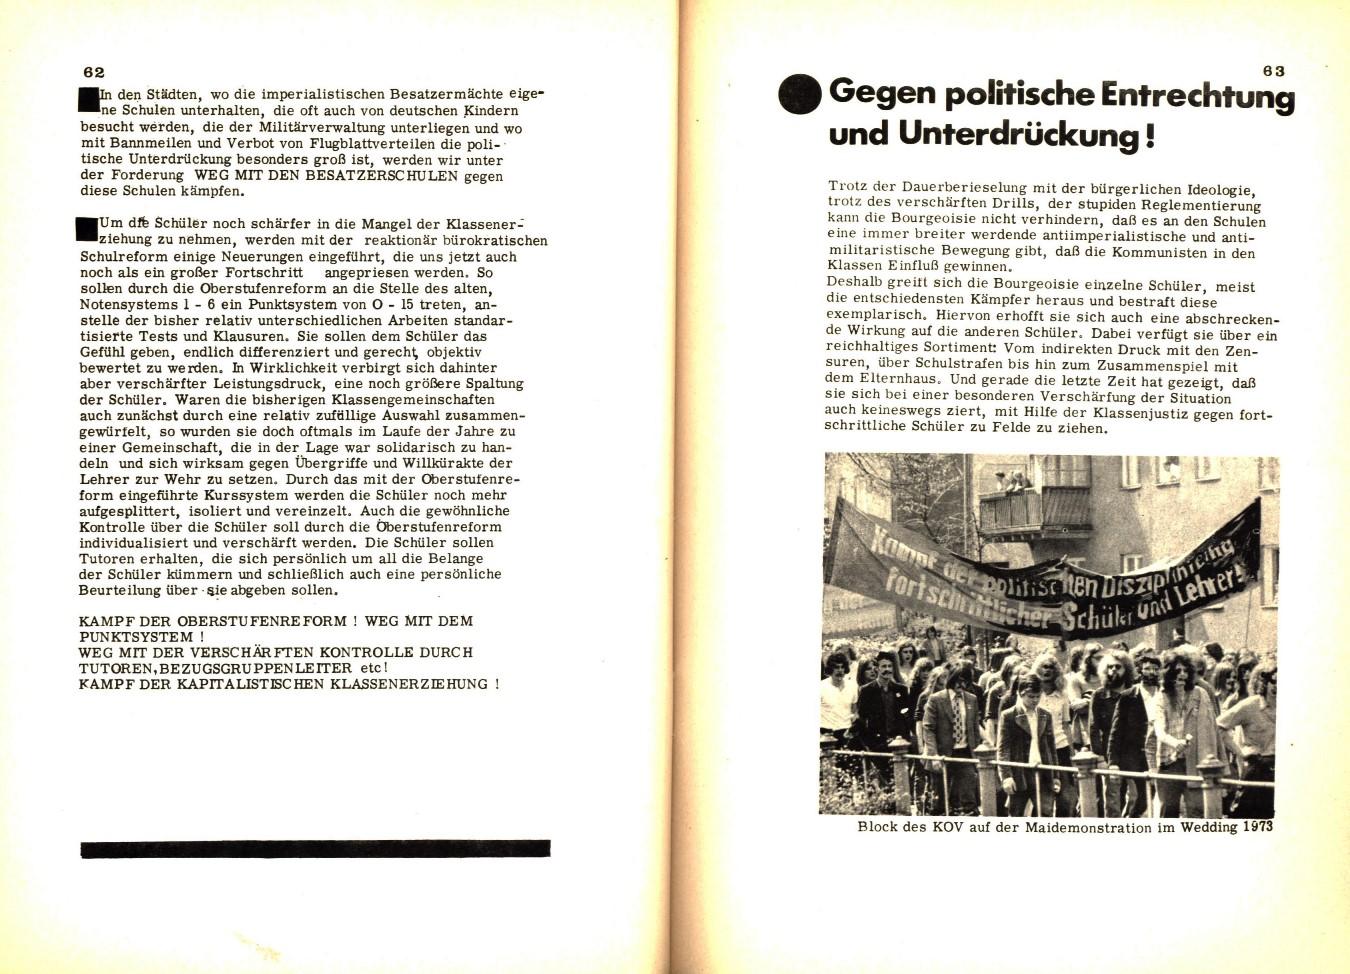 KOV_1973_Aktionsprogramm_34